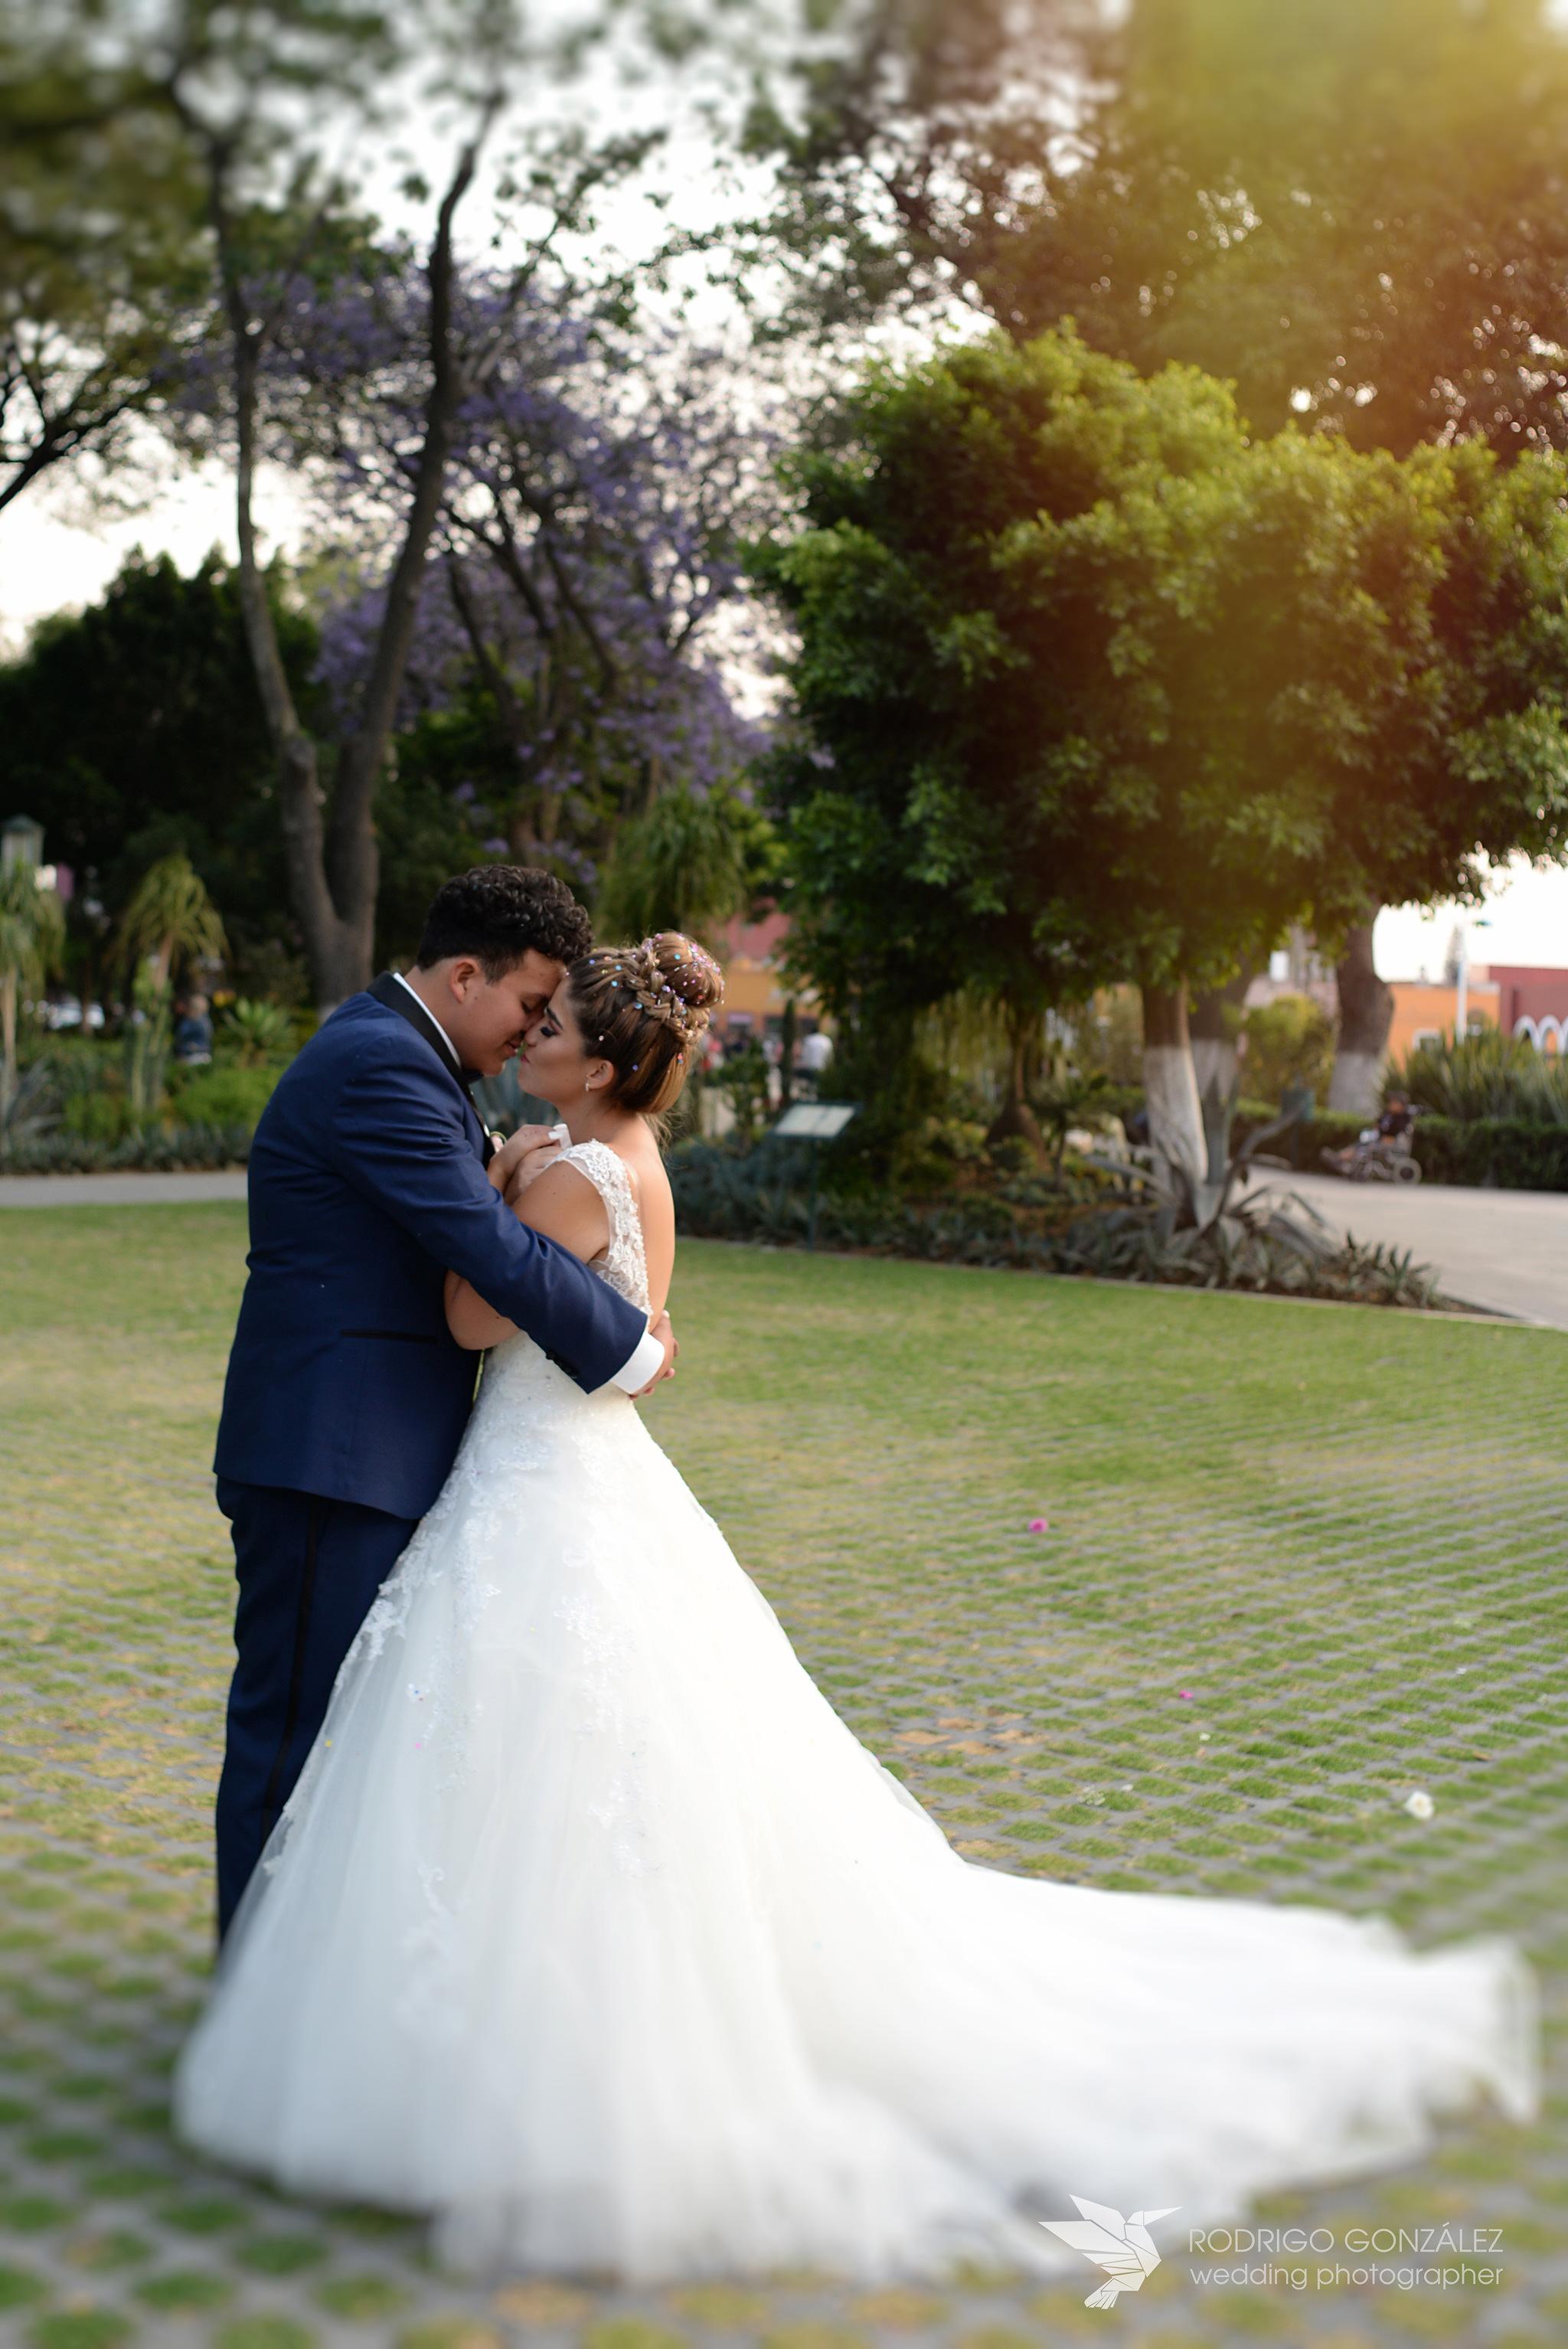 fotografias-de-bodas-en-puebla-0501a